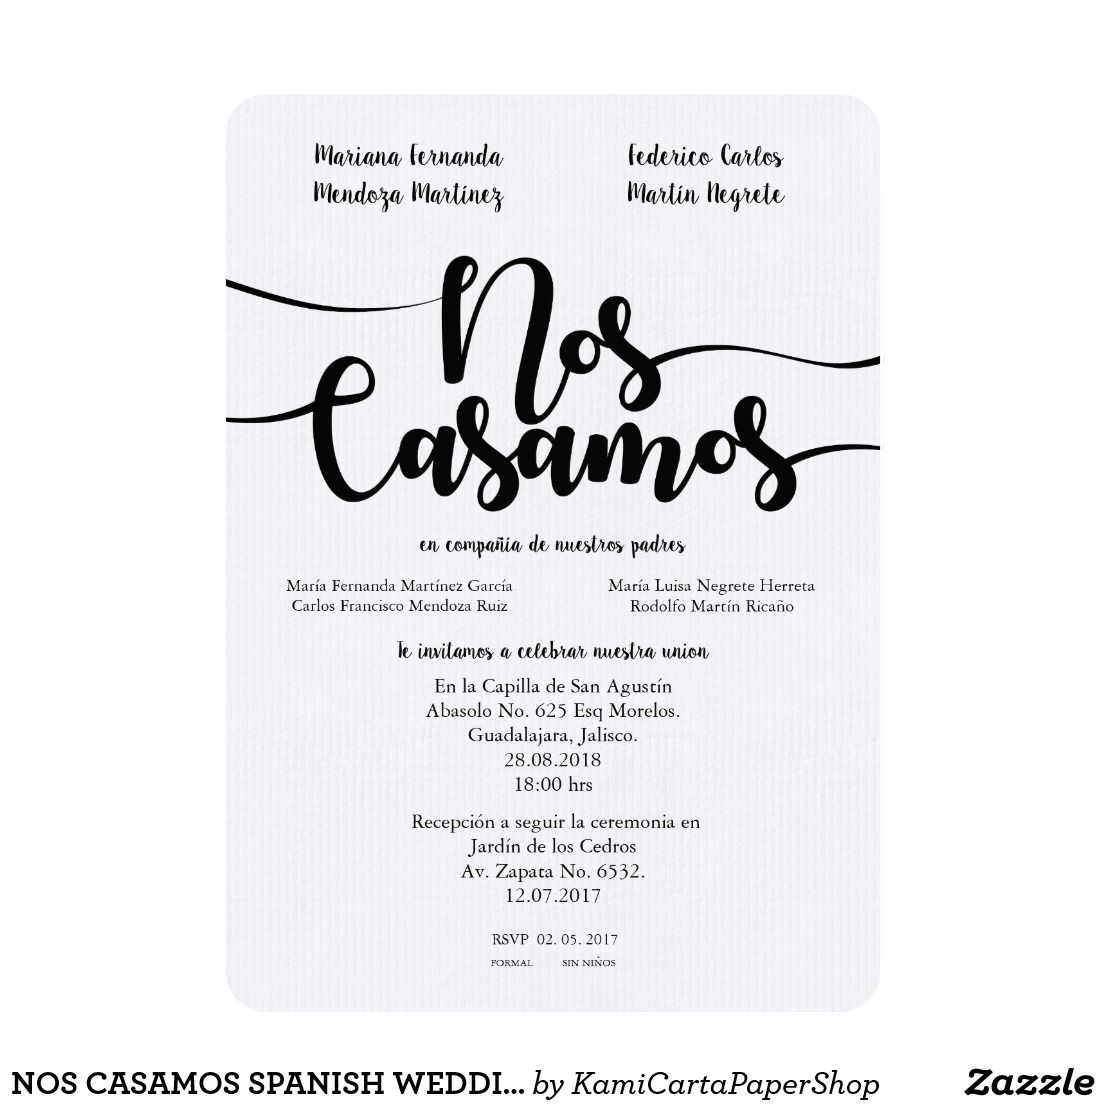 Nos Casamos Spanish Weddin Invitation Zazzle Com